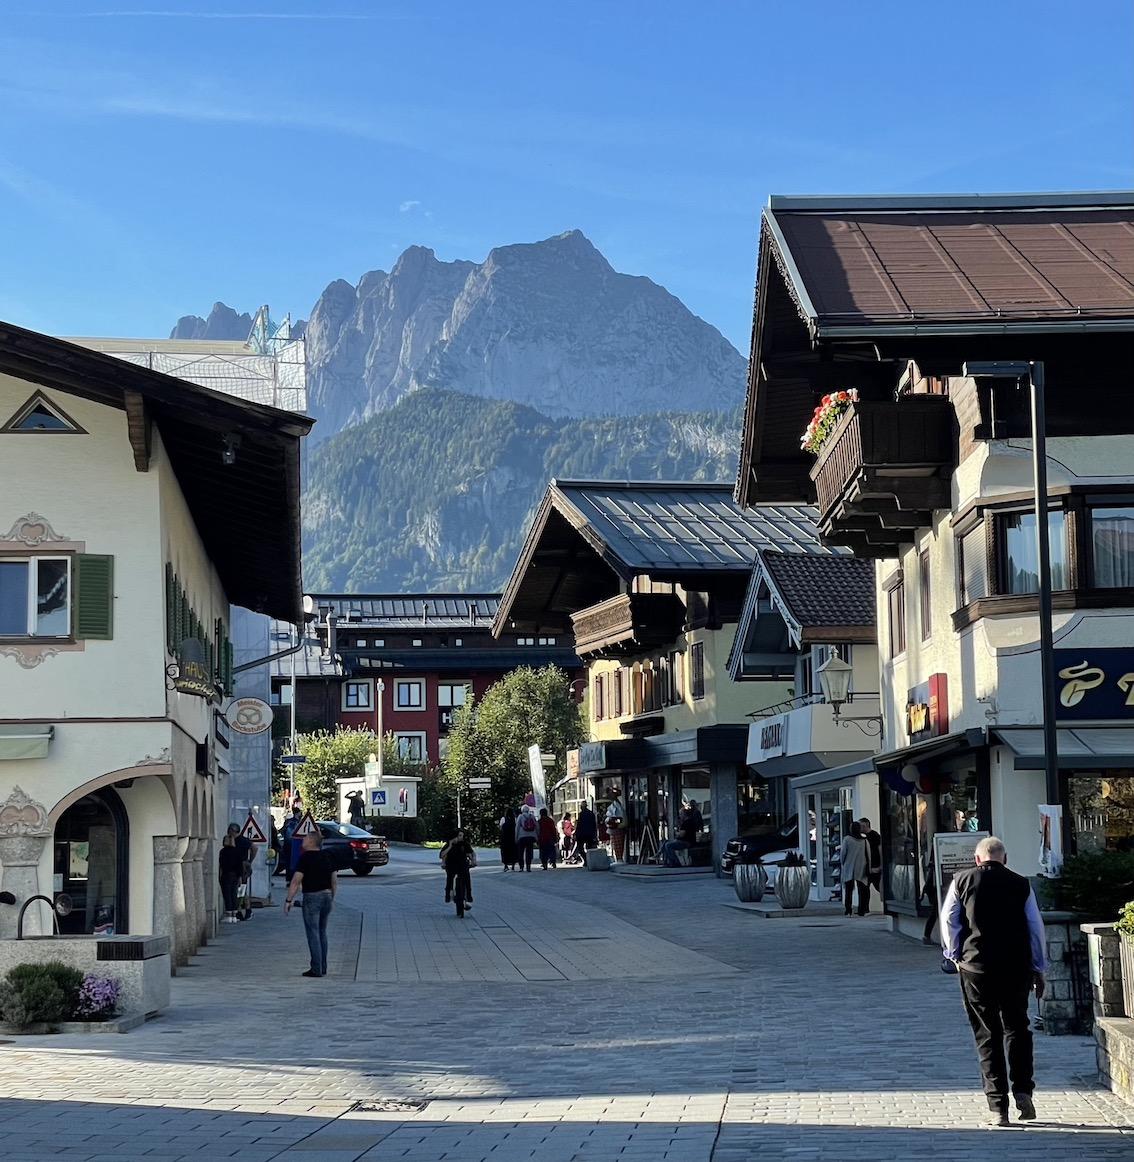 COOEE alpin Kitzbüheler Alpen - GenussReise.blog